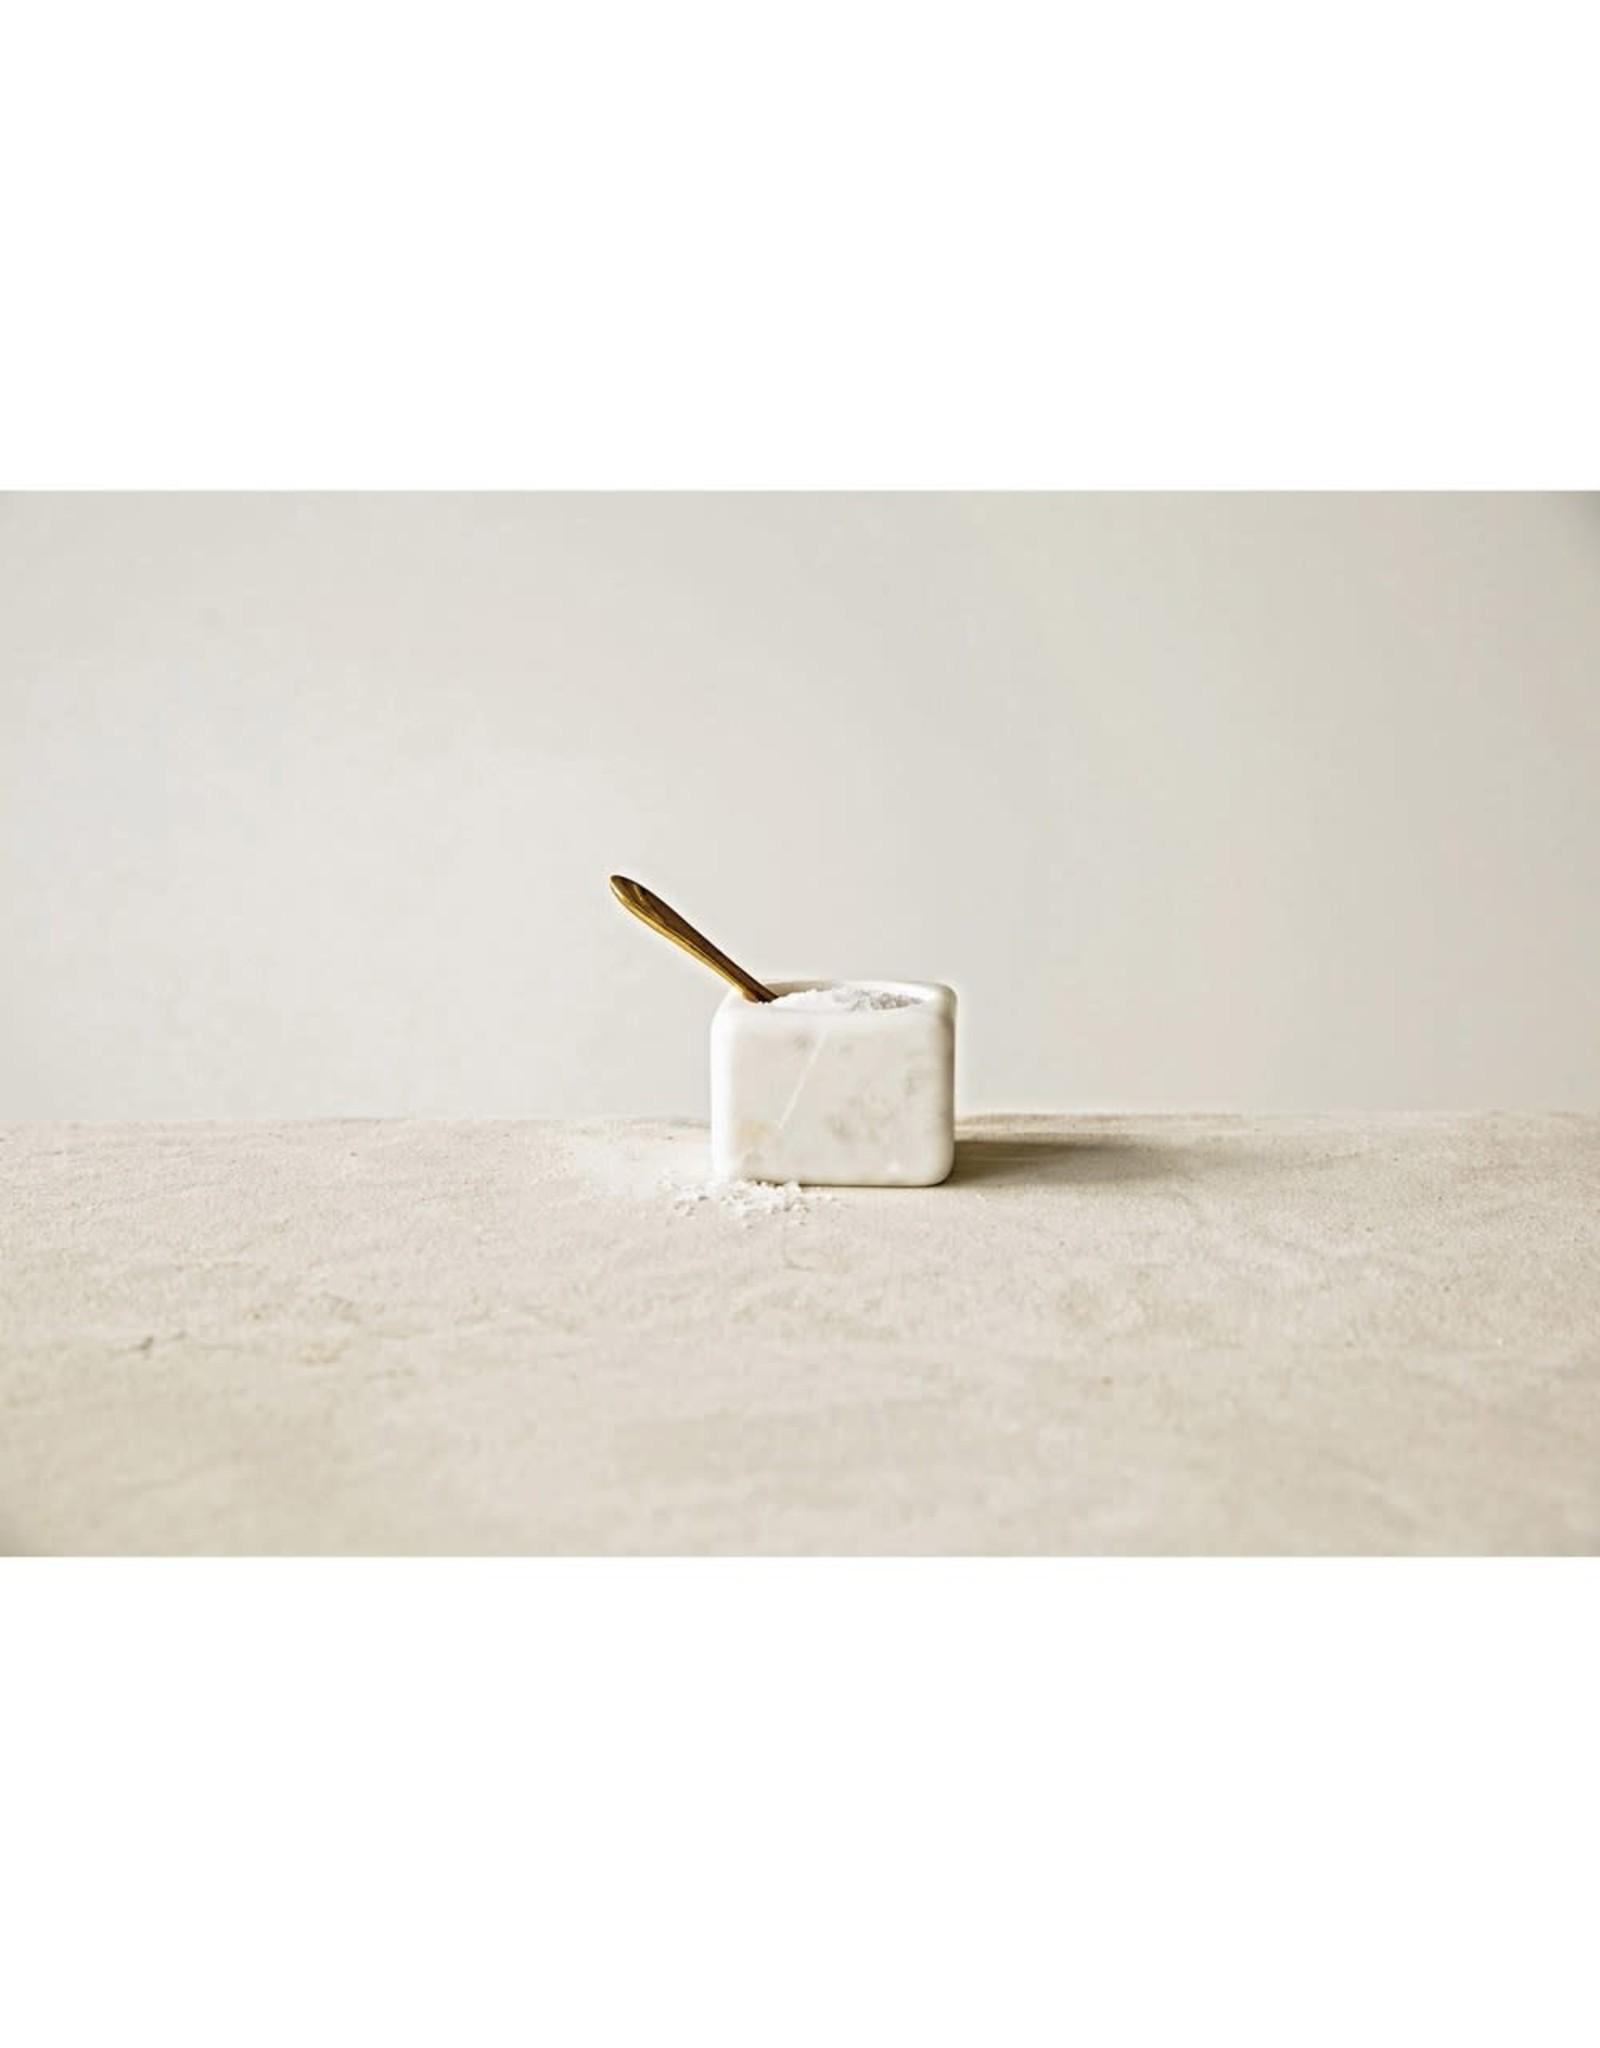 Oak + Arrow Interiors White Marble Bowl w/ Brass Spoon